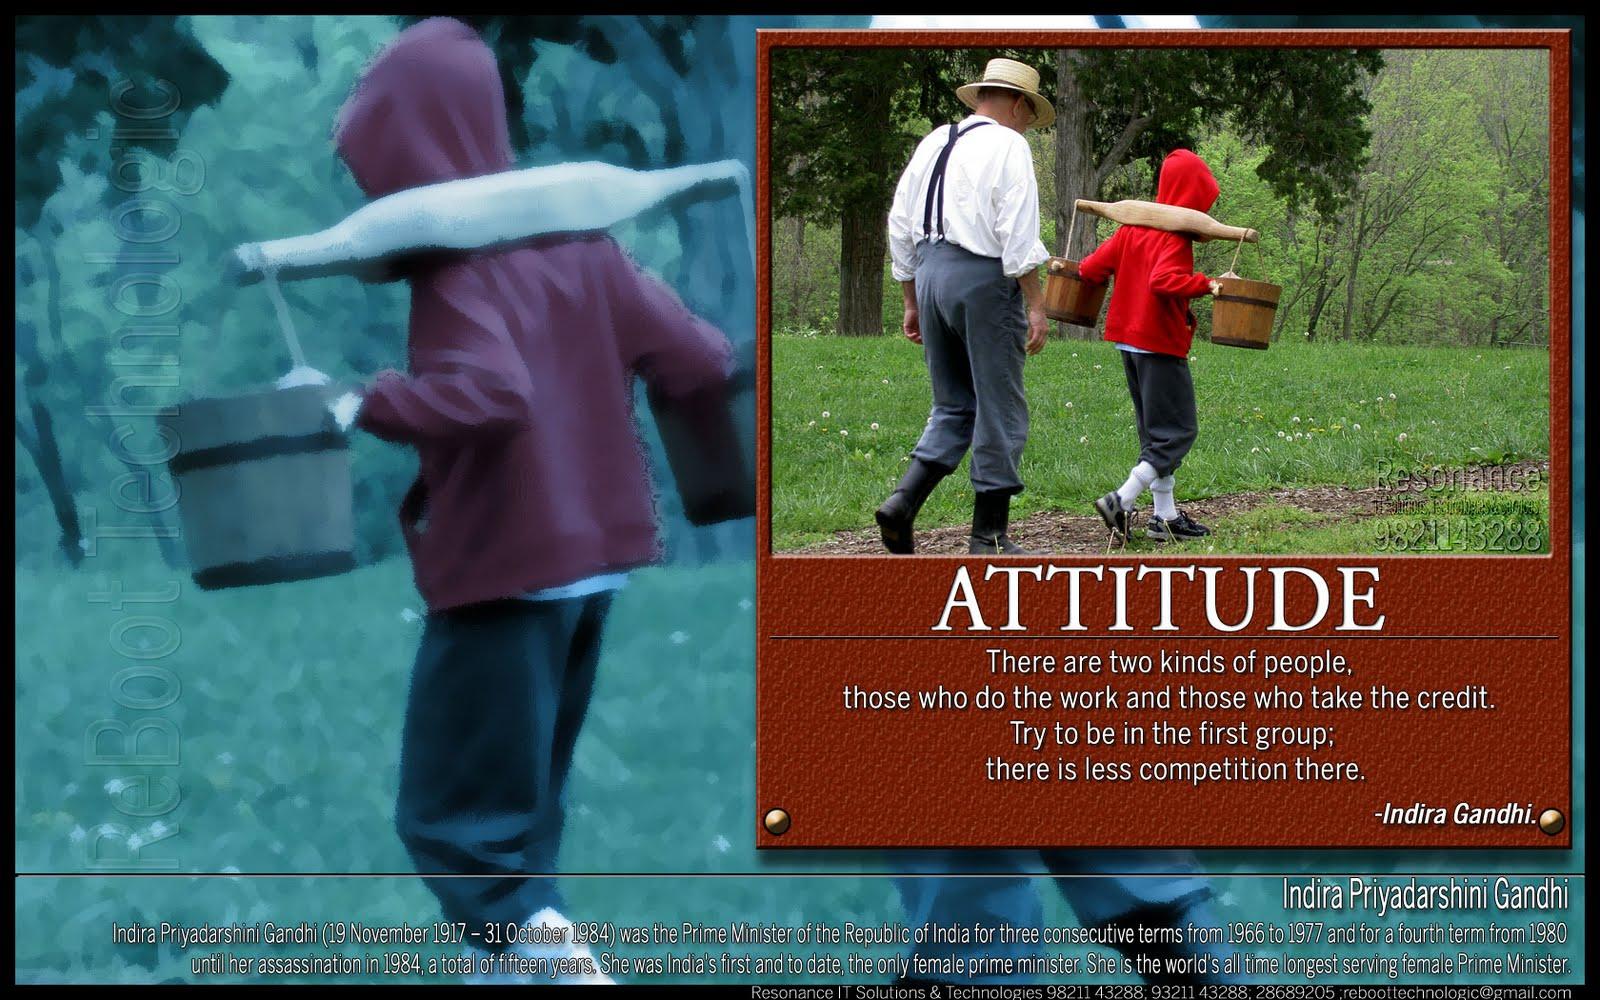 http://1.bp.blogspot.com/_WEbwceD8uAI/TExU7kPMfdI/AAAAAAAABC0/w5opWLXrYmI/s1600/Quotes-On-Desk-Attitude2.jpg